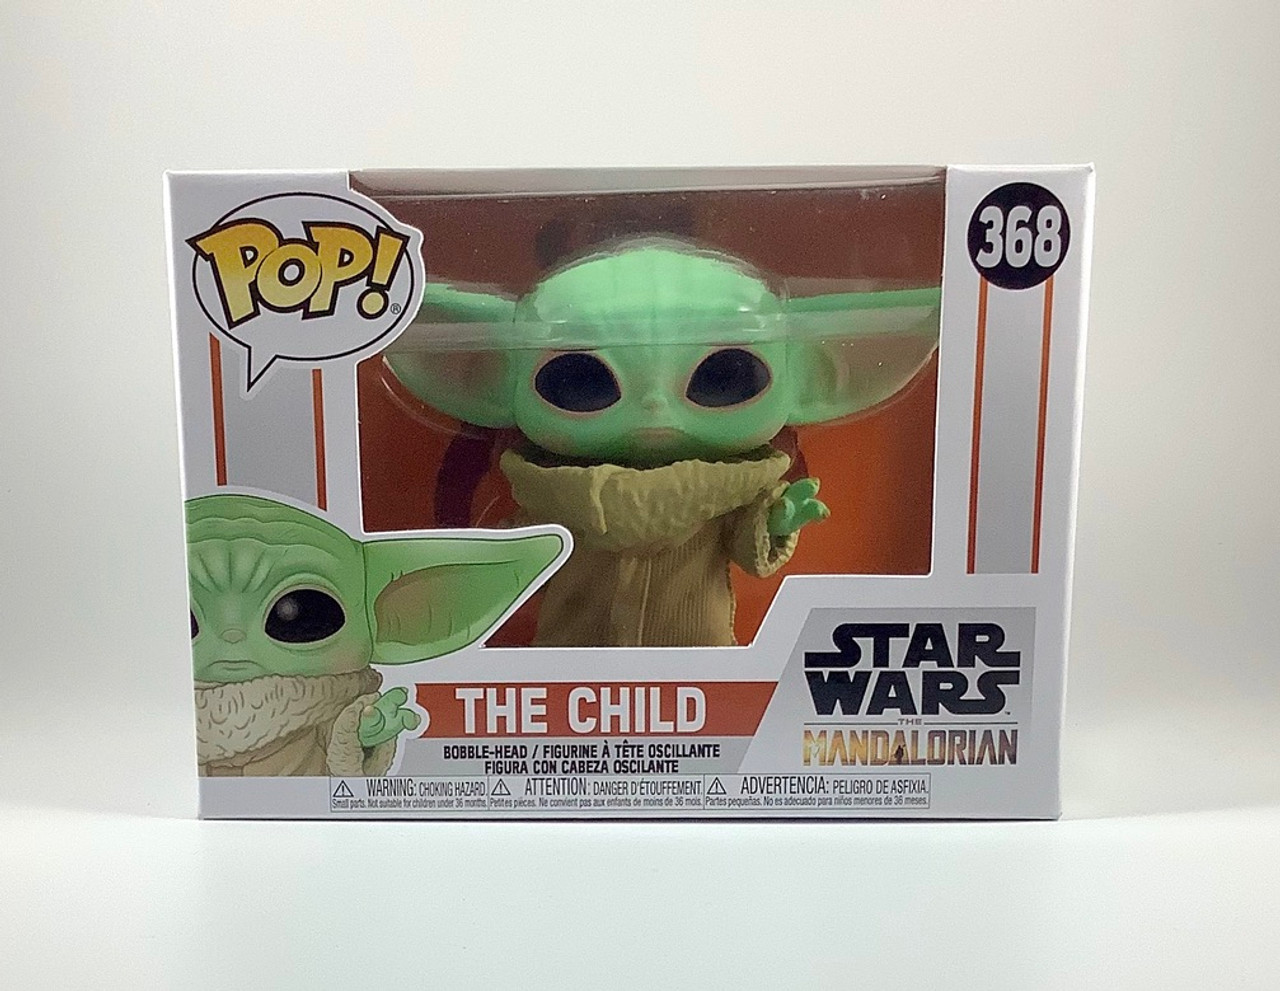 The Child Star Wars The Mandalorian